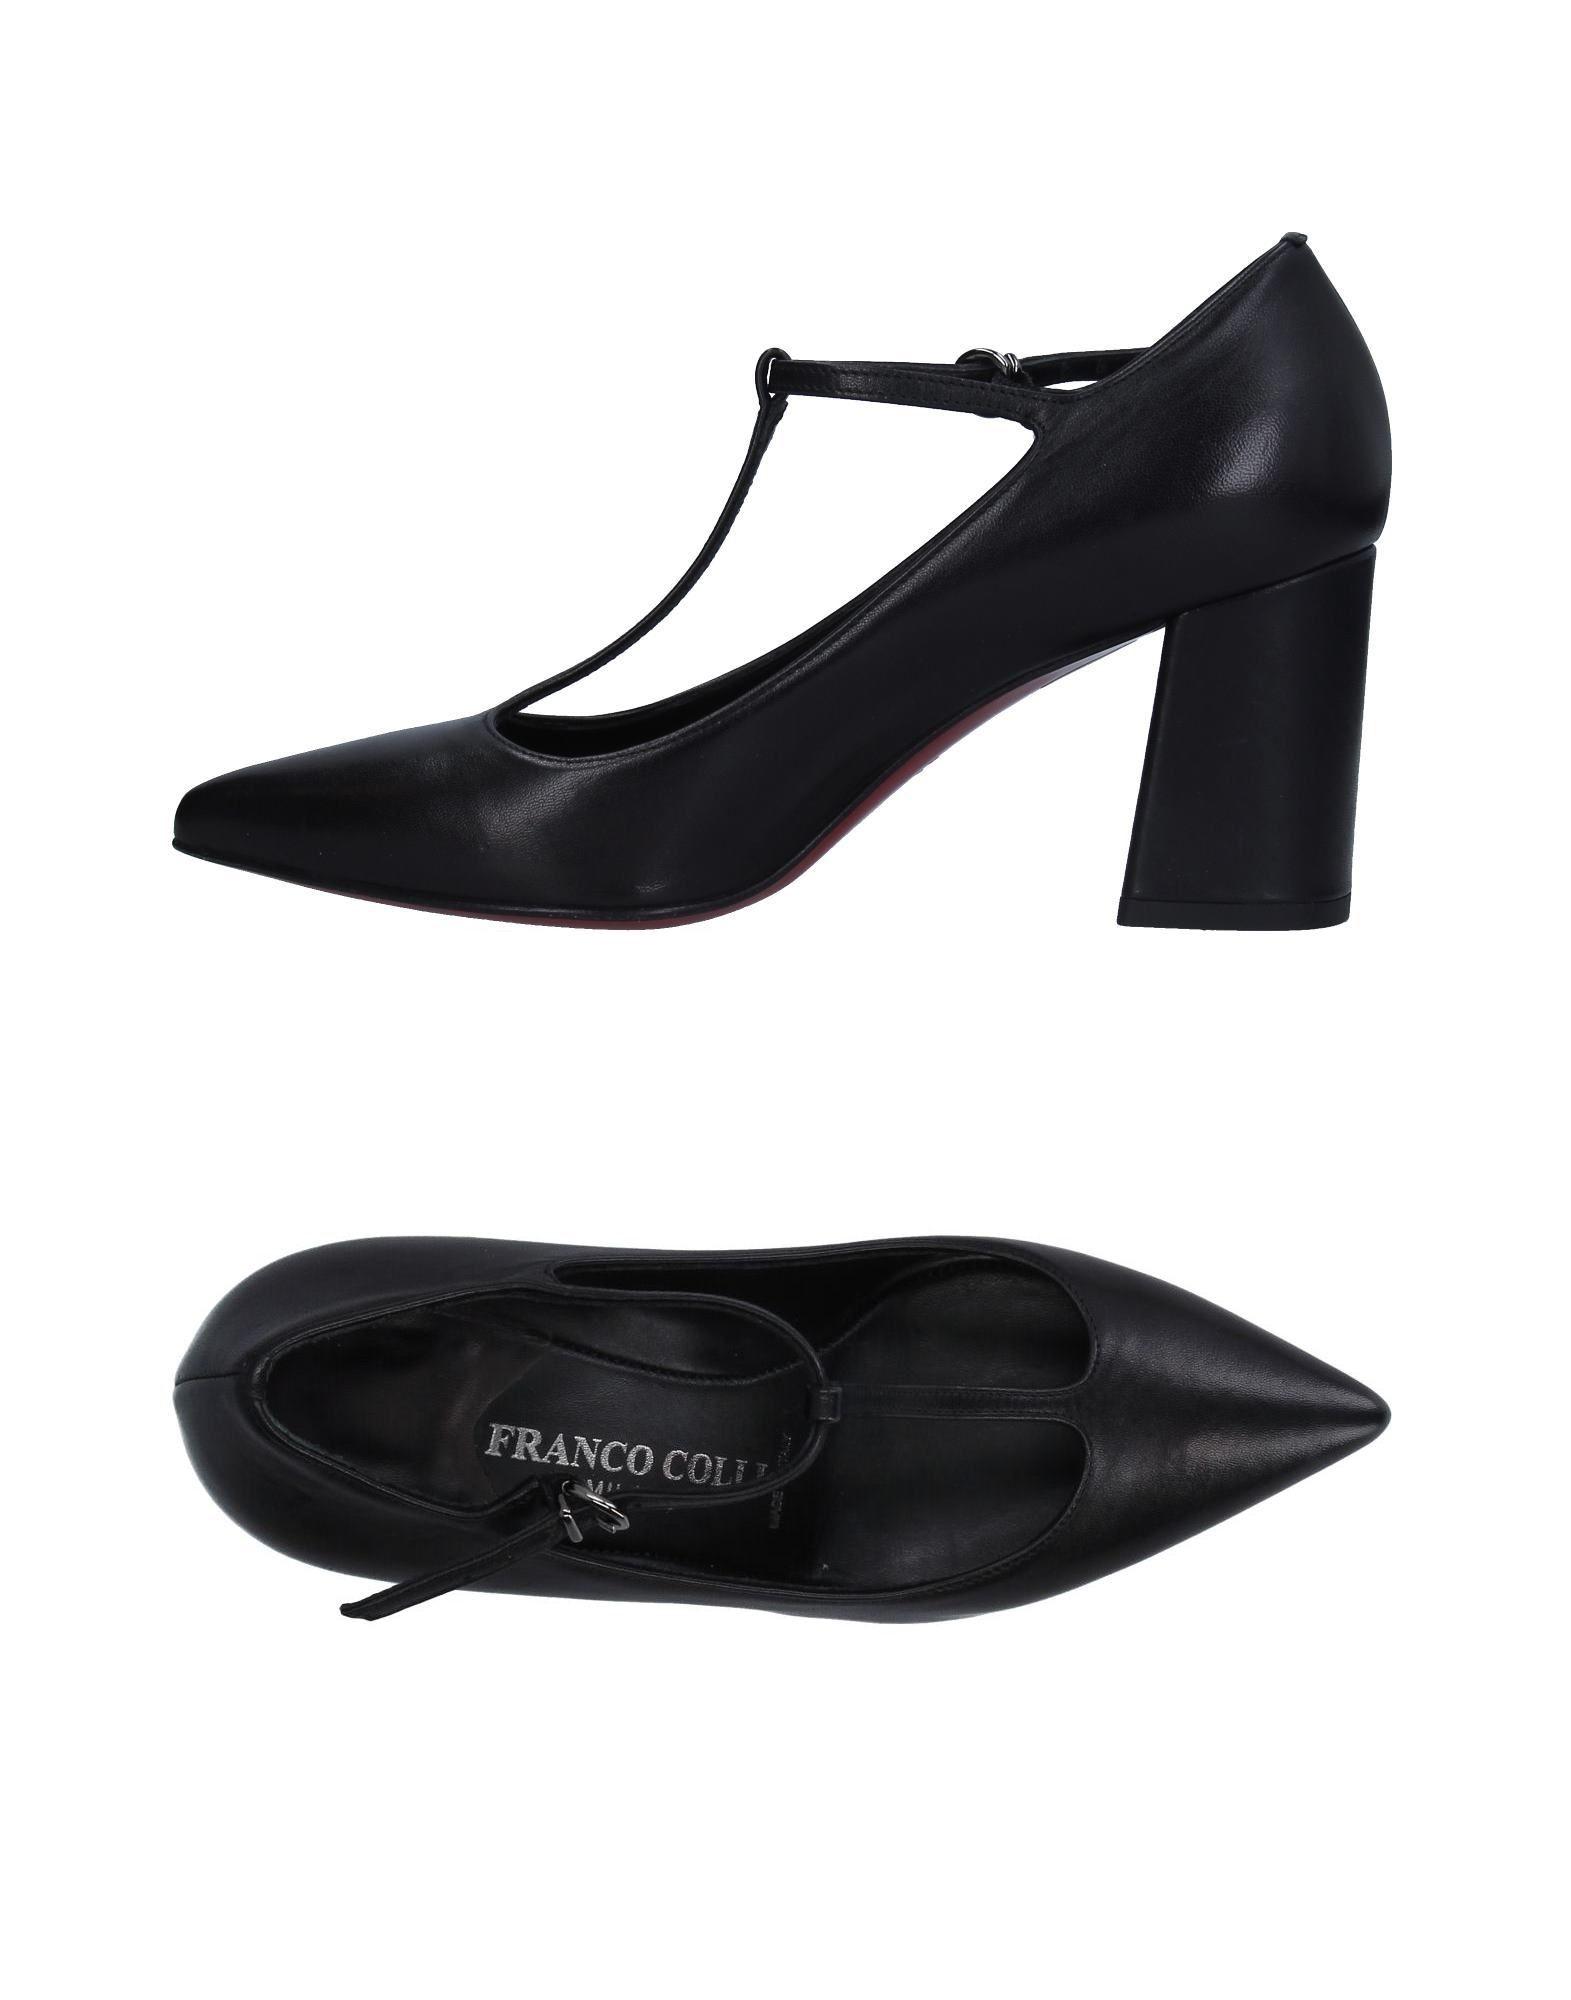 Escarpins Franco Colli Femme - Escarpins Franco Colli sur